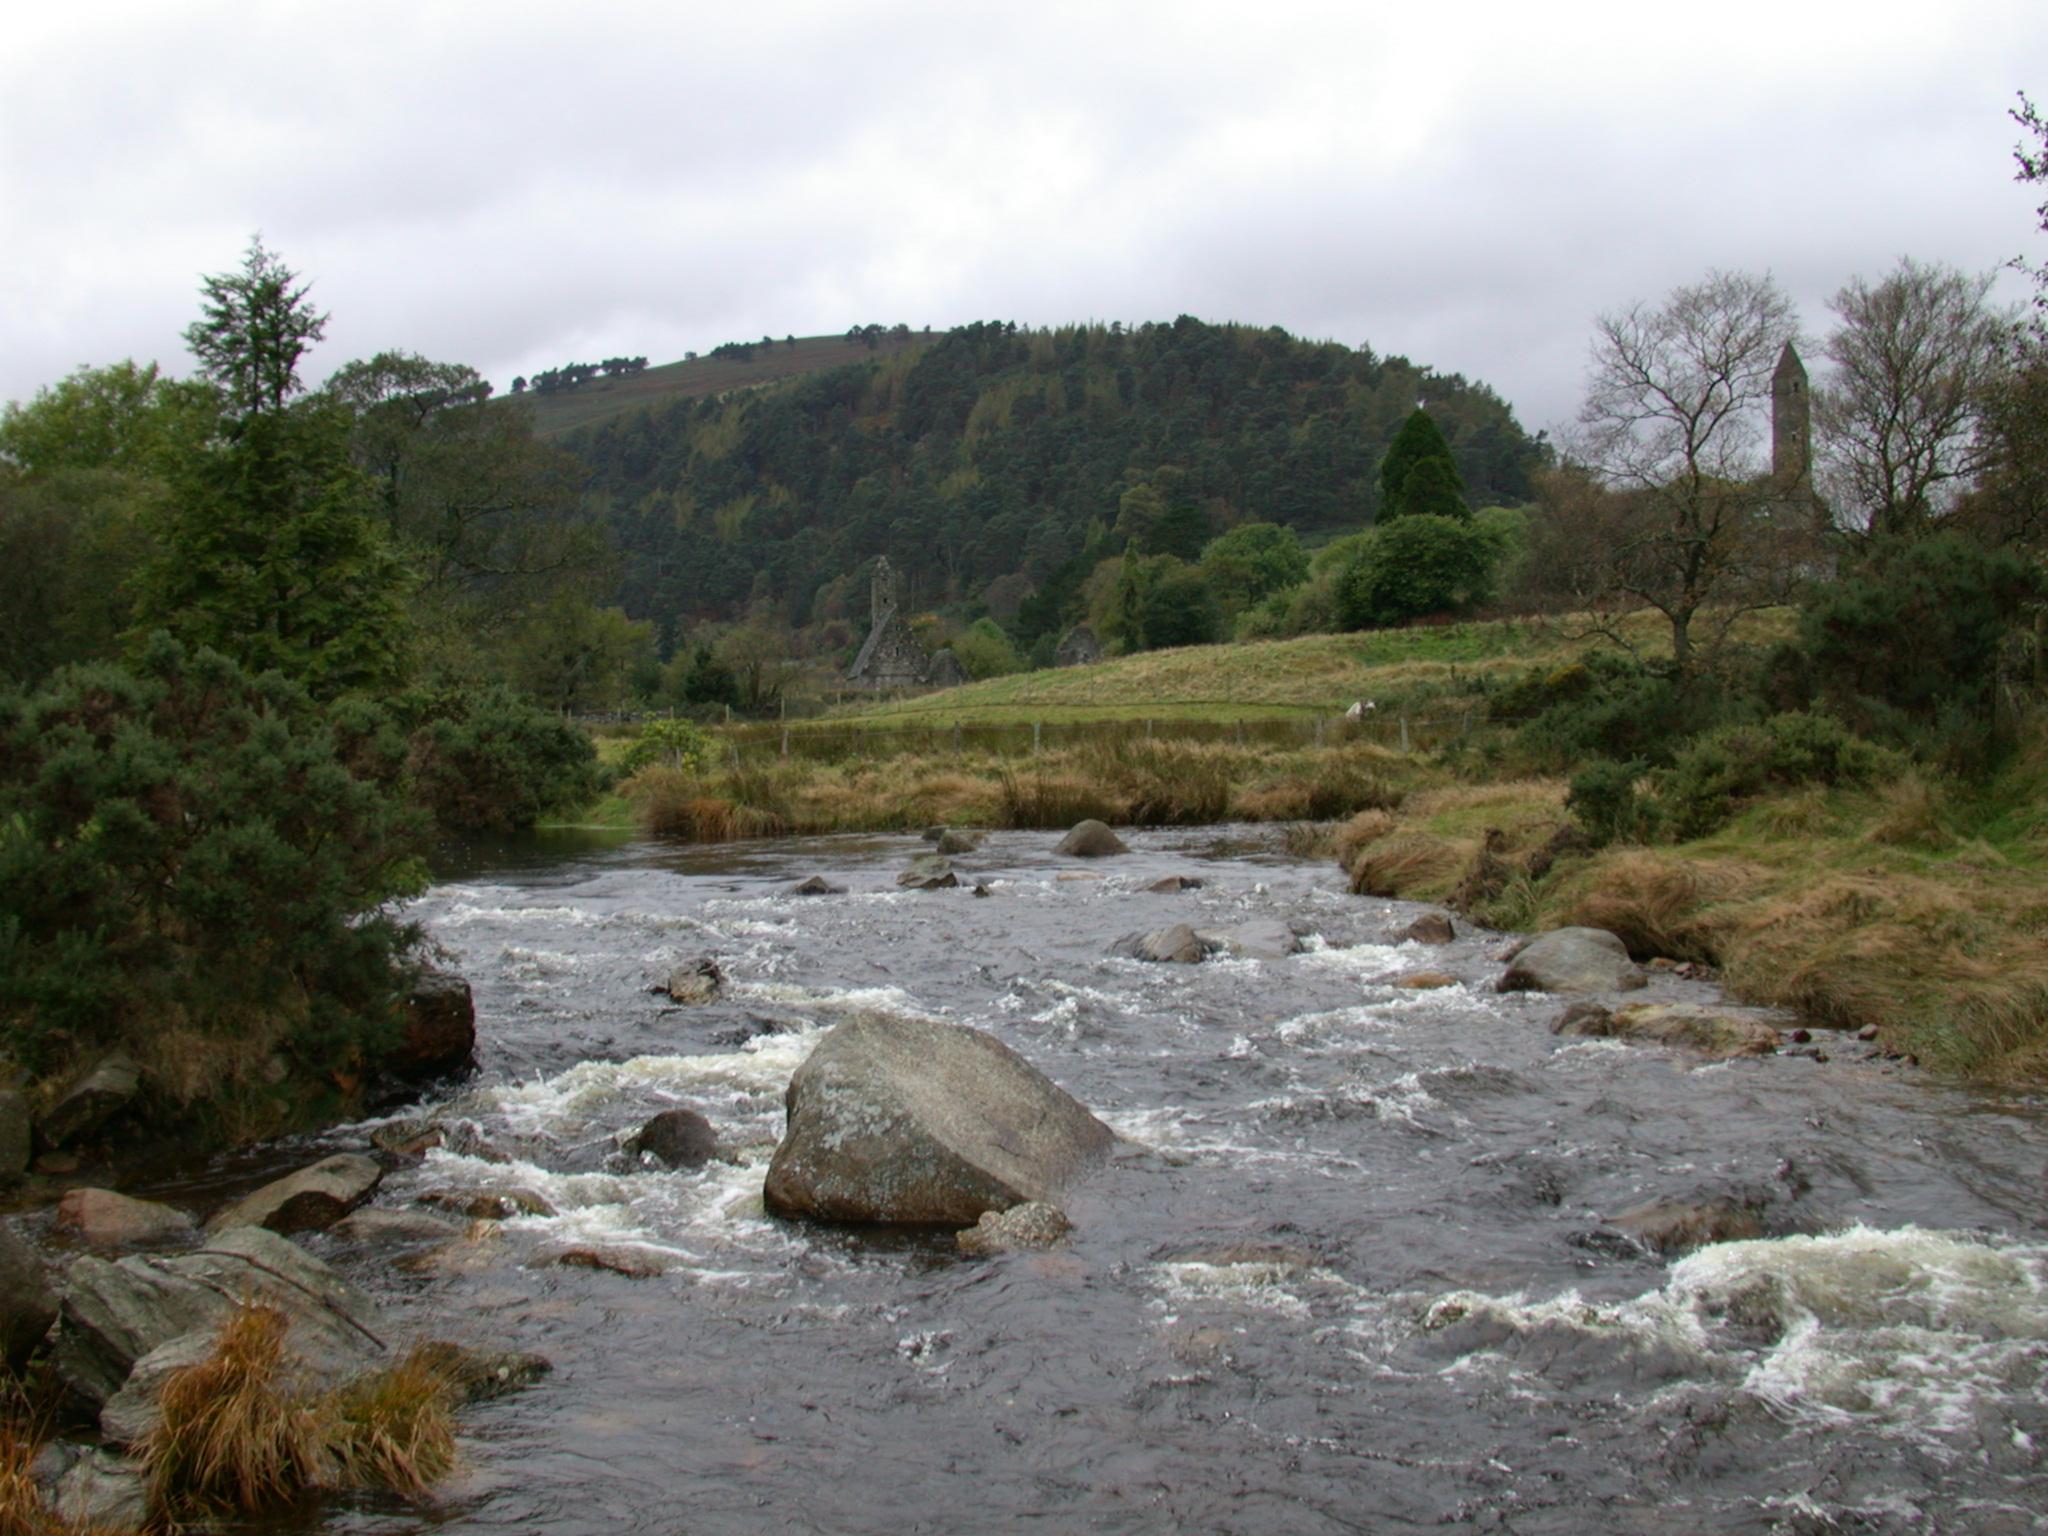 river rivuket brook stream streaming highland of scotland flow flowing rocks rocky wild